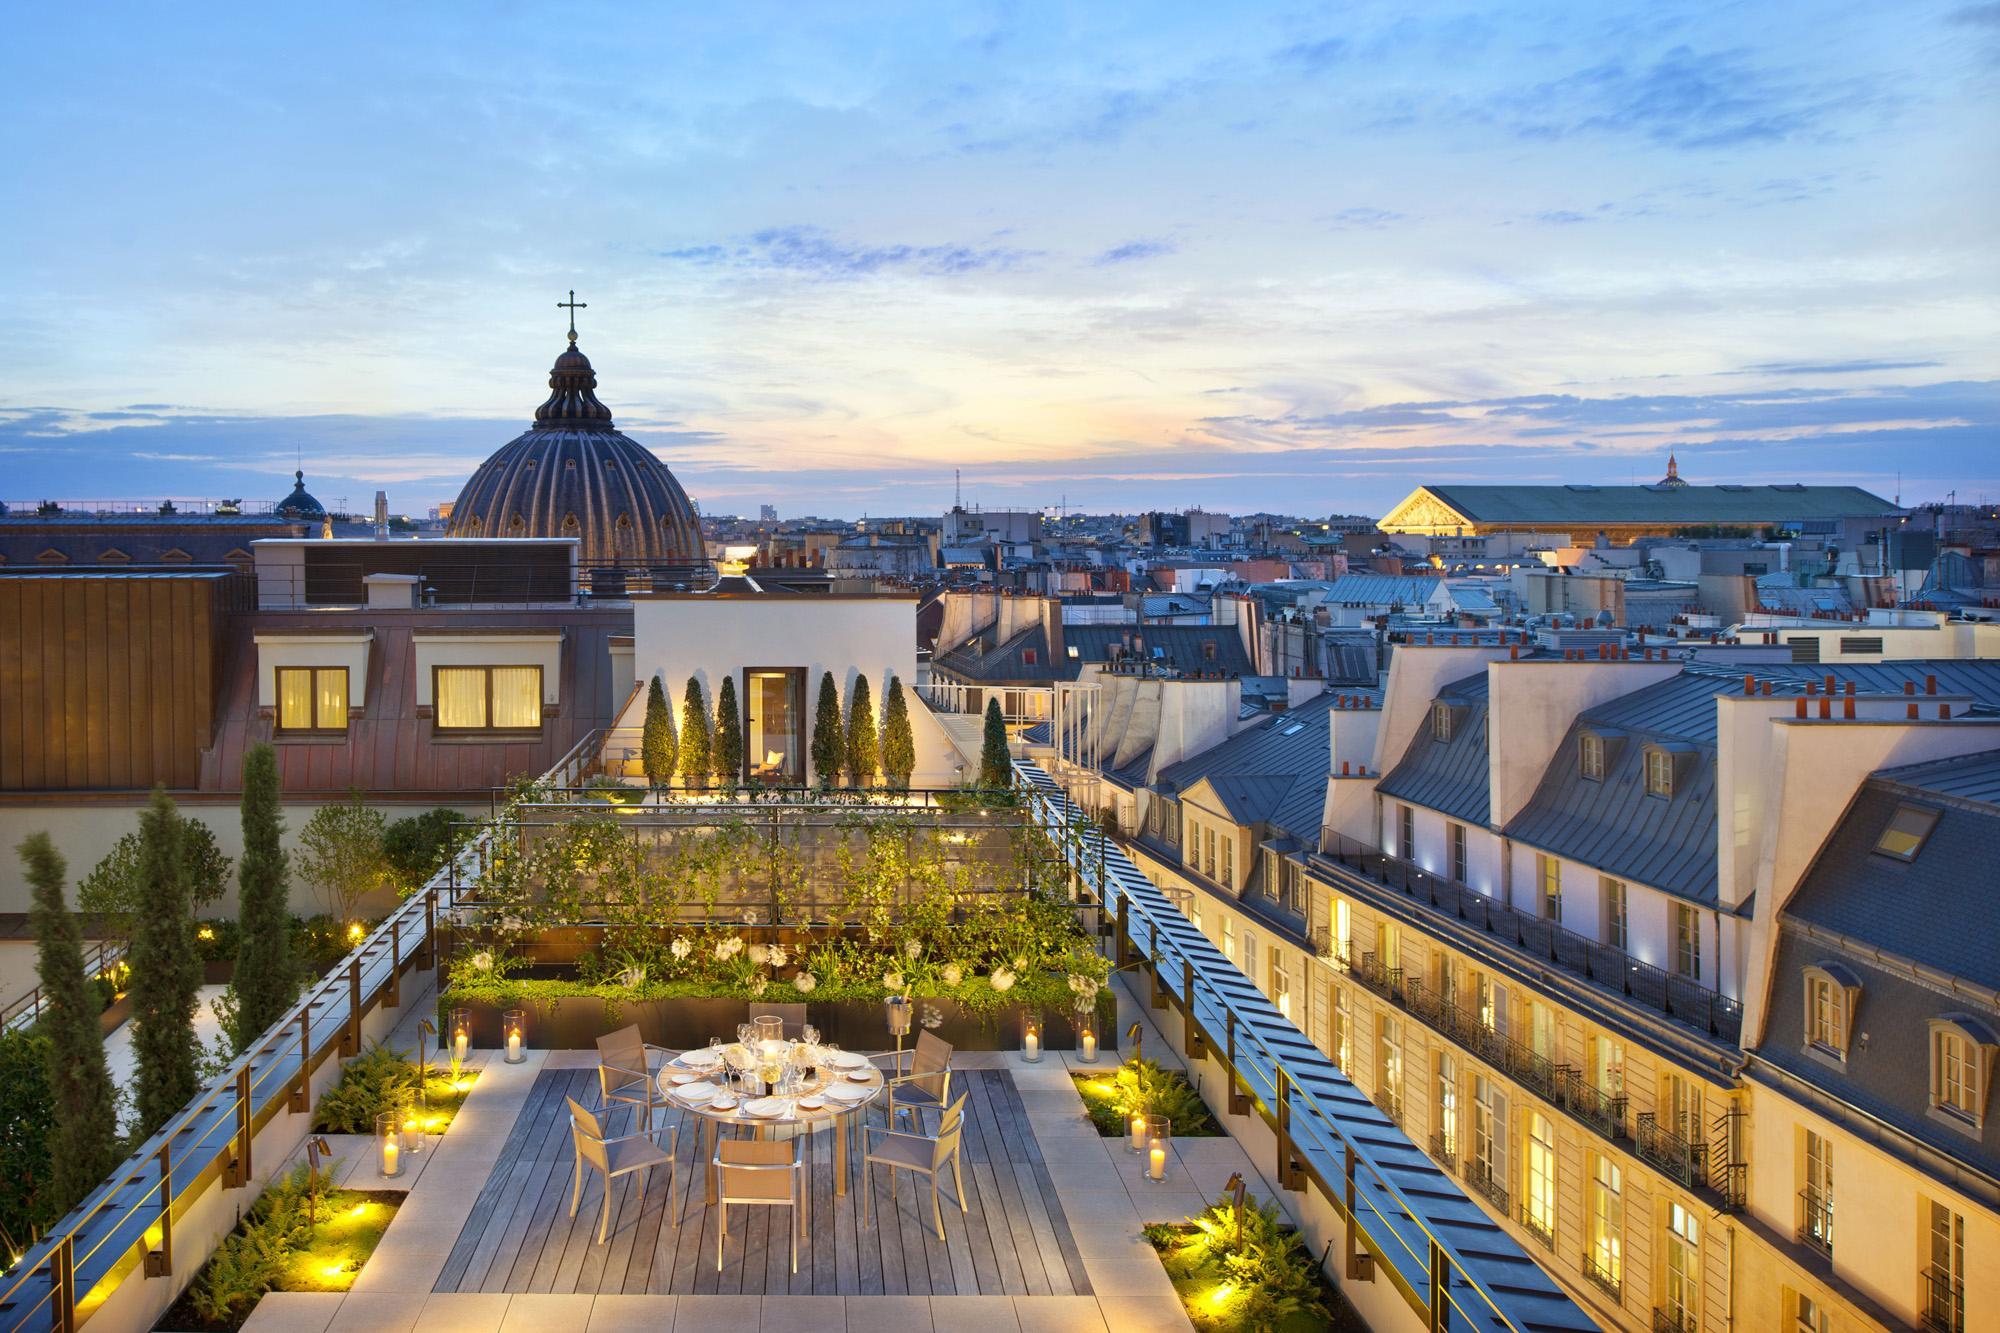 Maryo 39 s bazaar terrasse mandarin oriental paris for 15 royal terrace